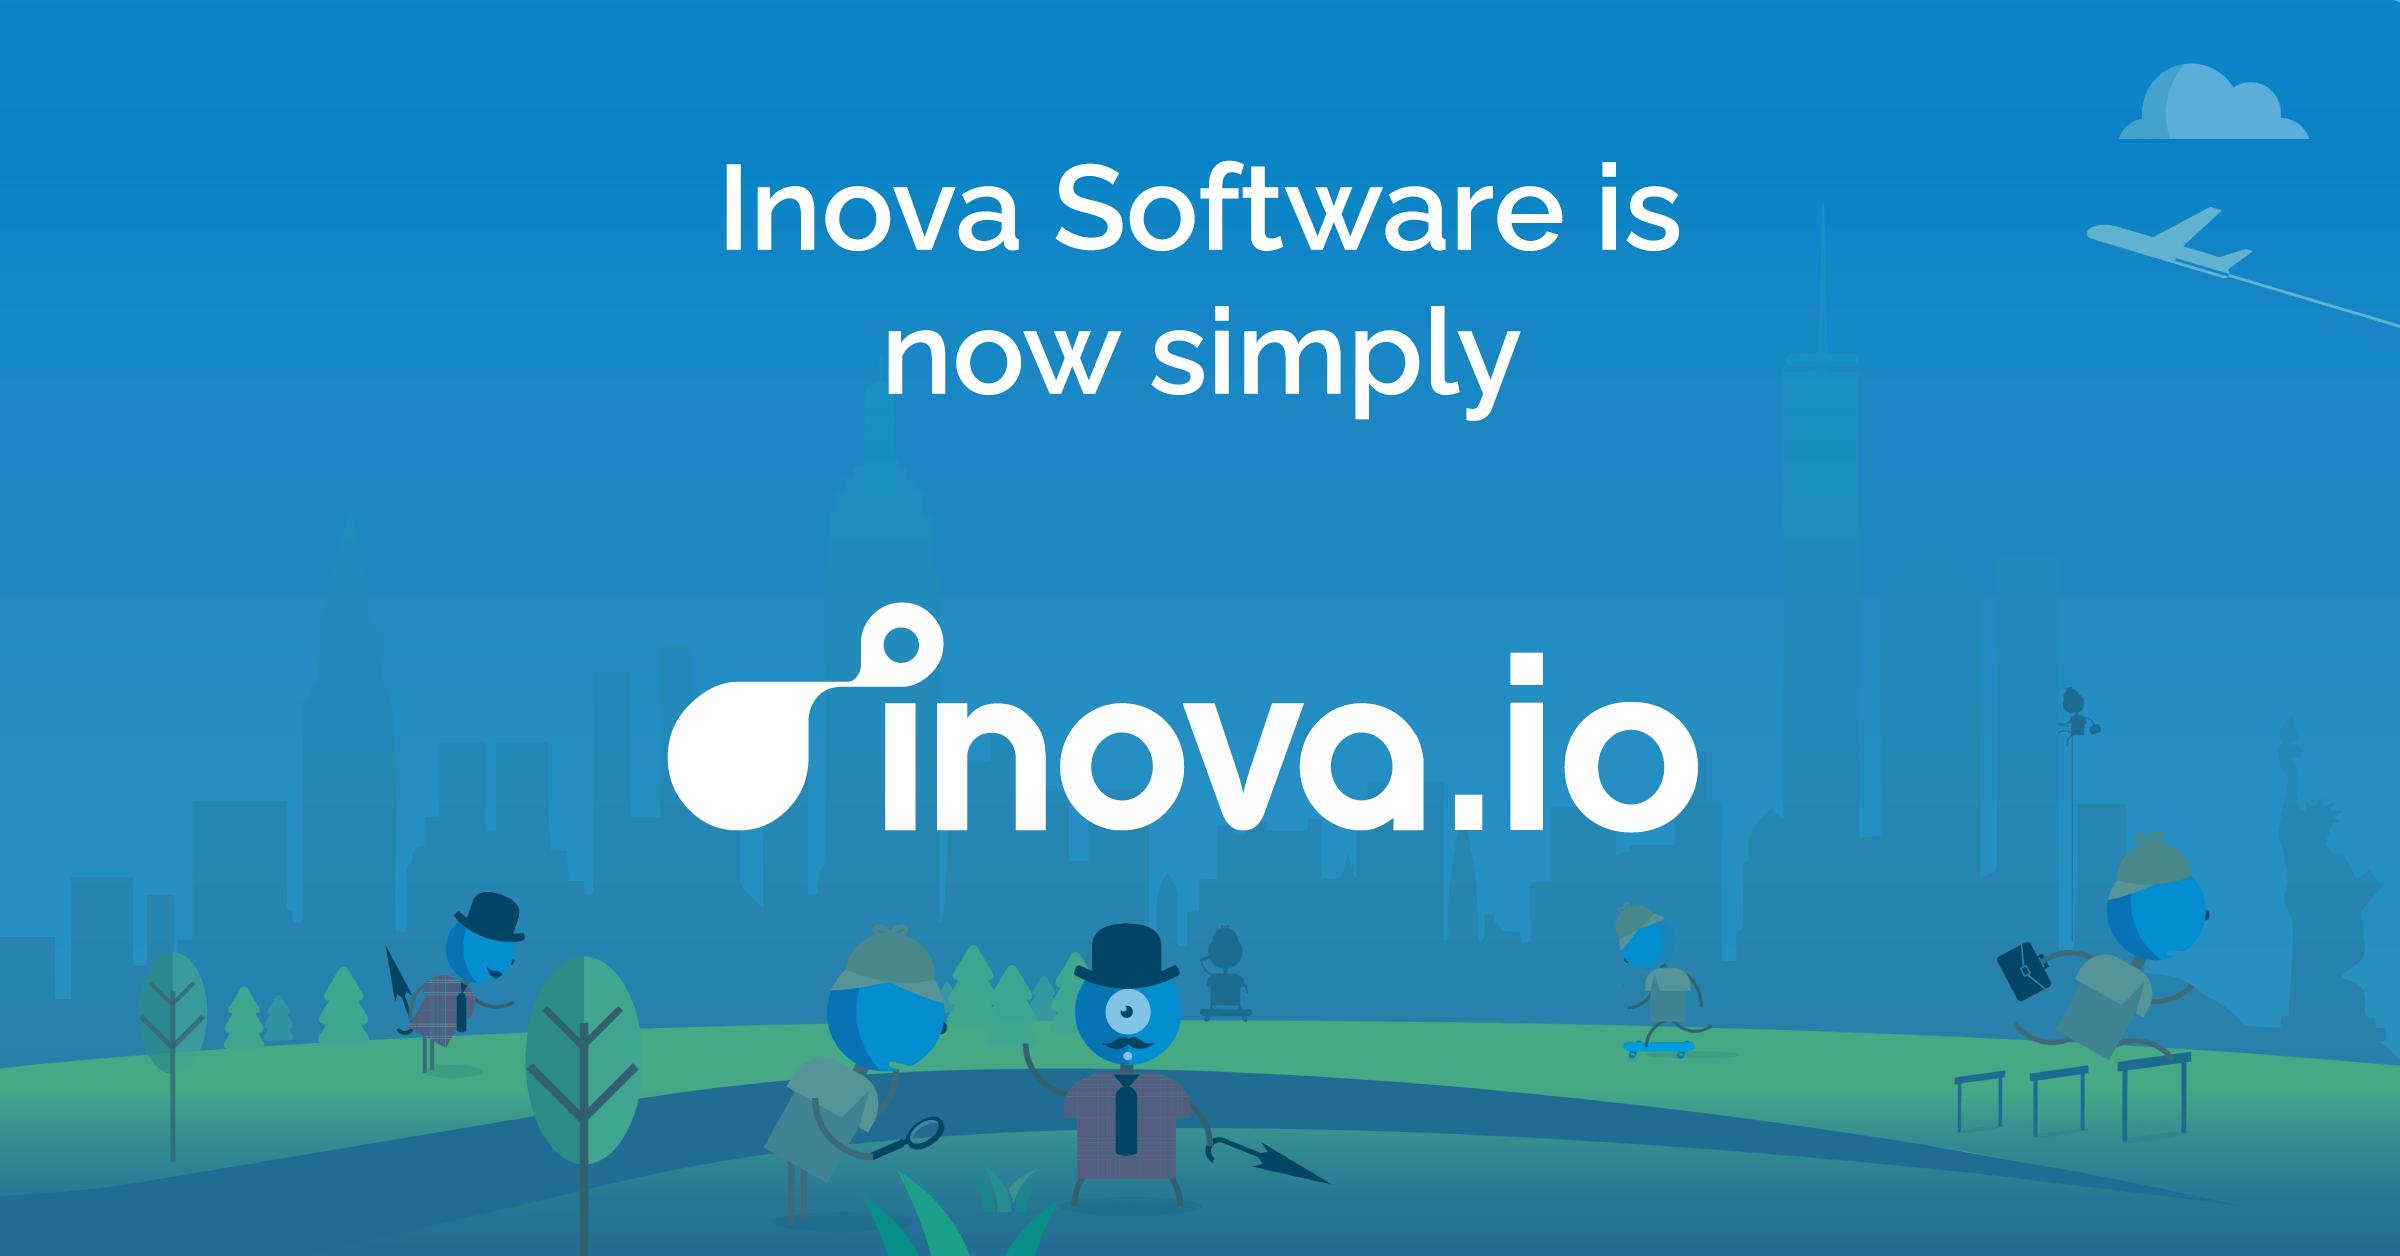 Call us Inova.